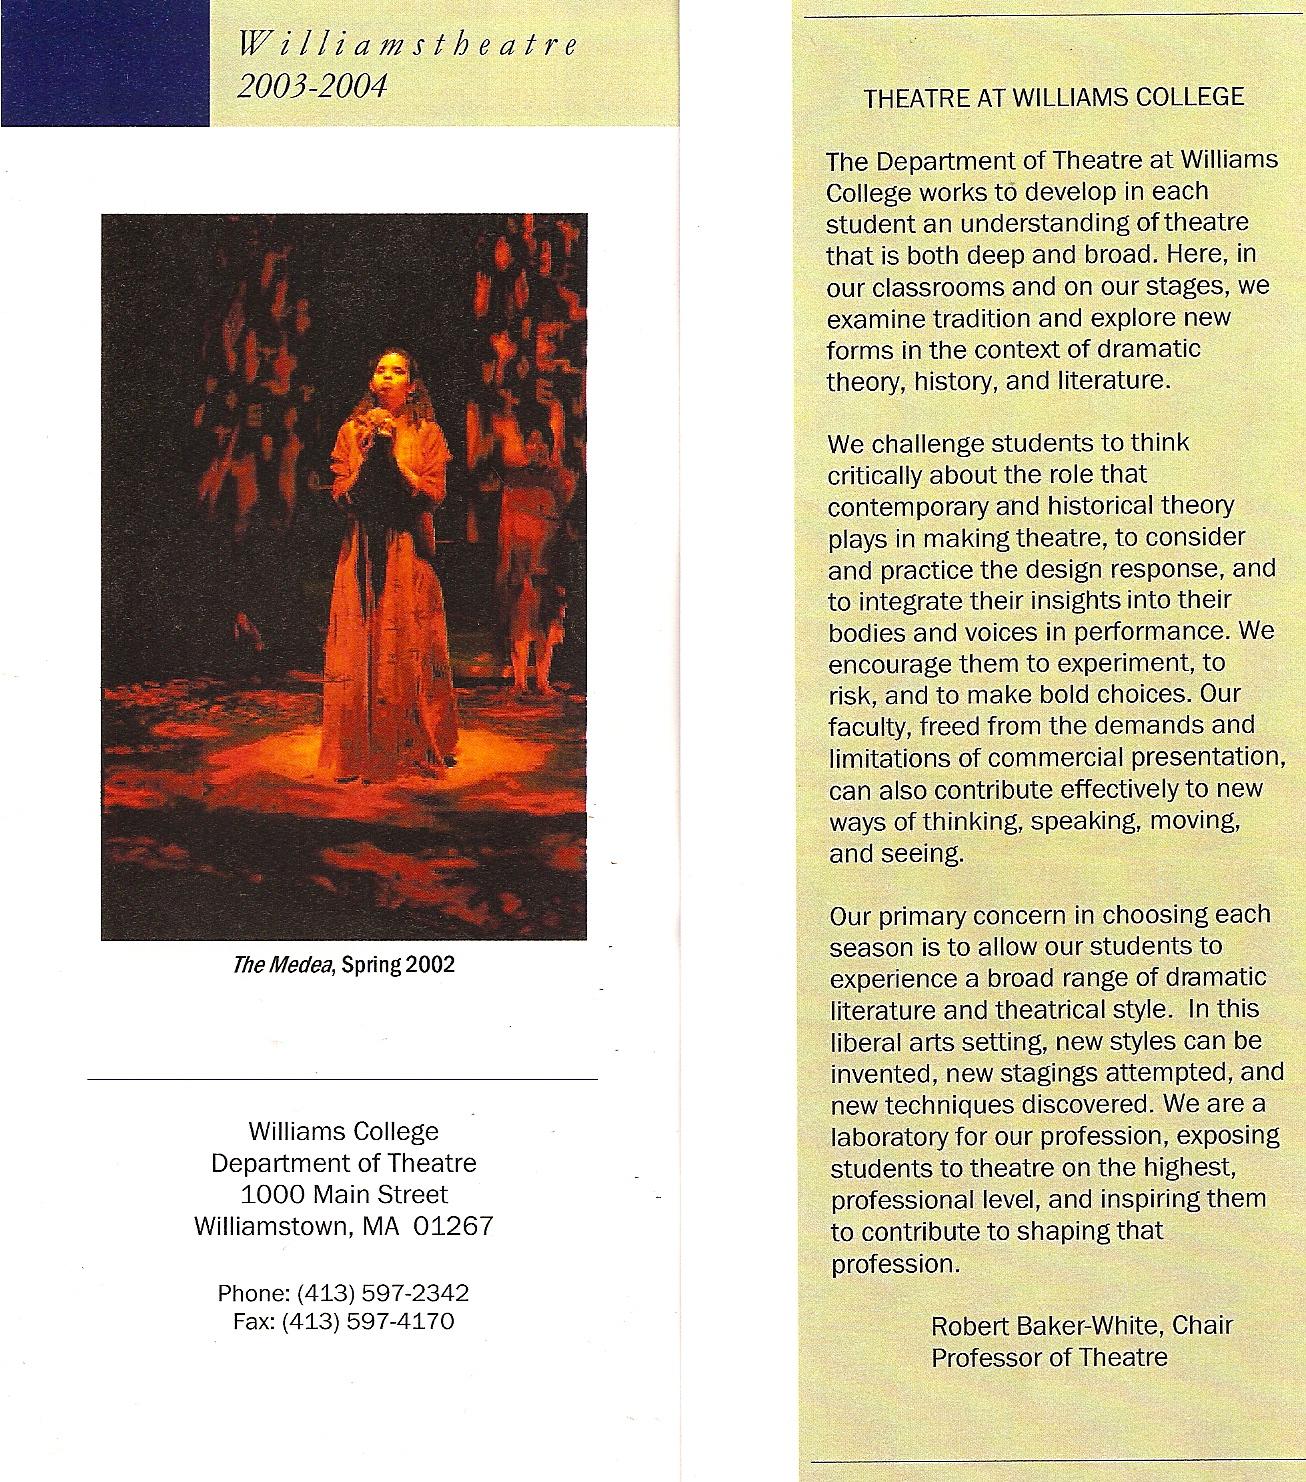 Williamstheatre cover with Medea